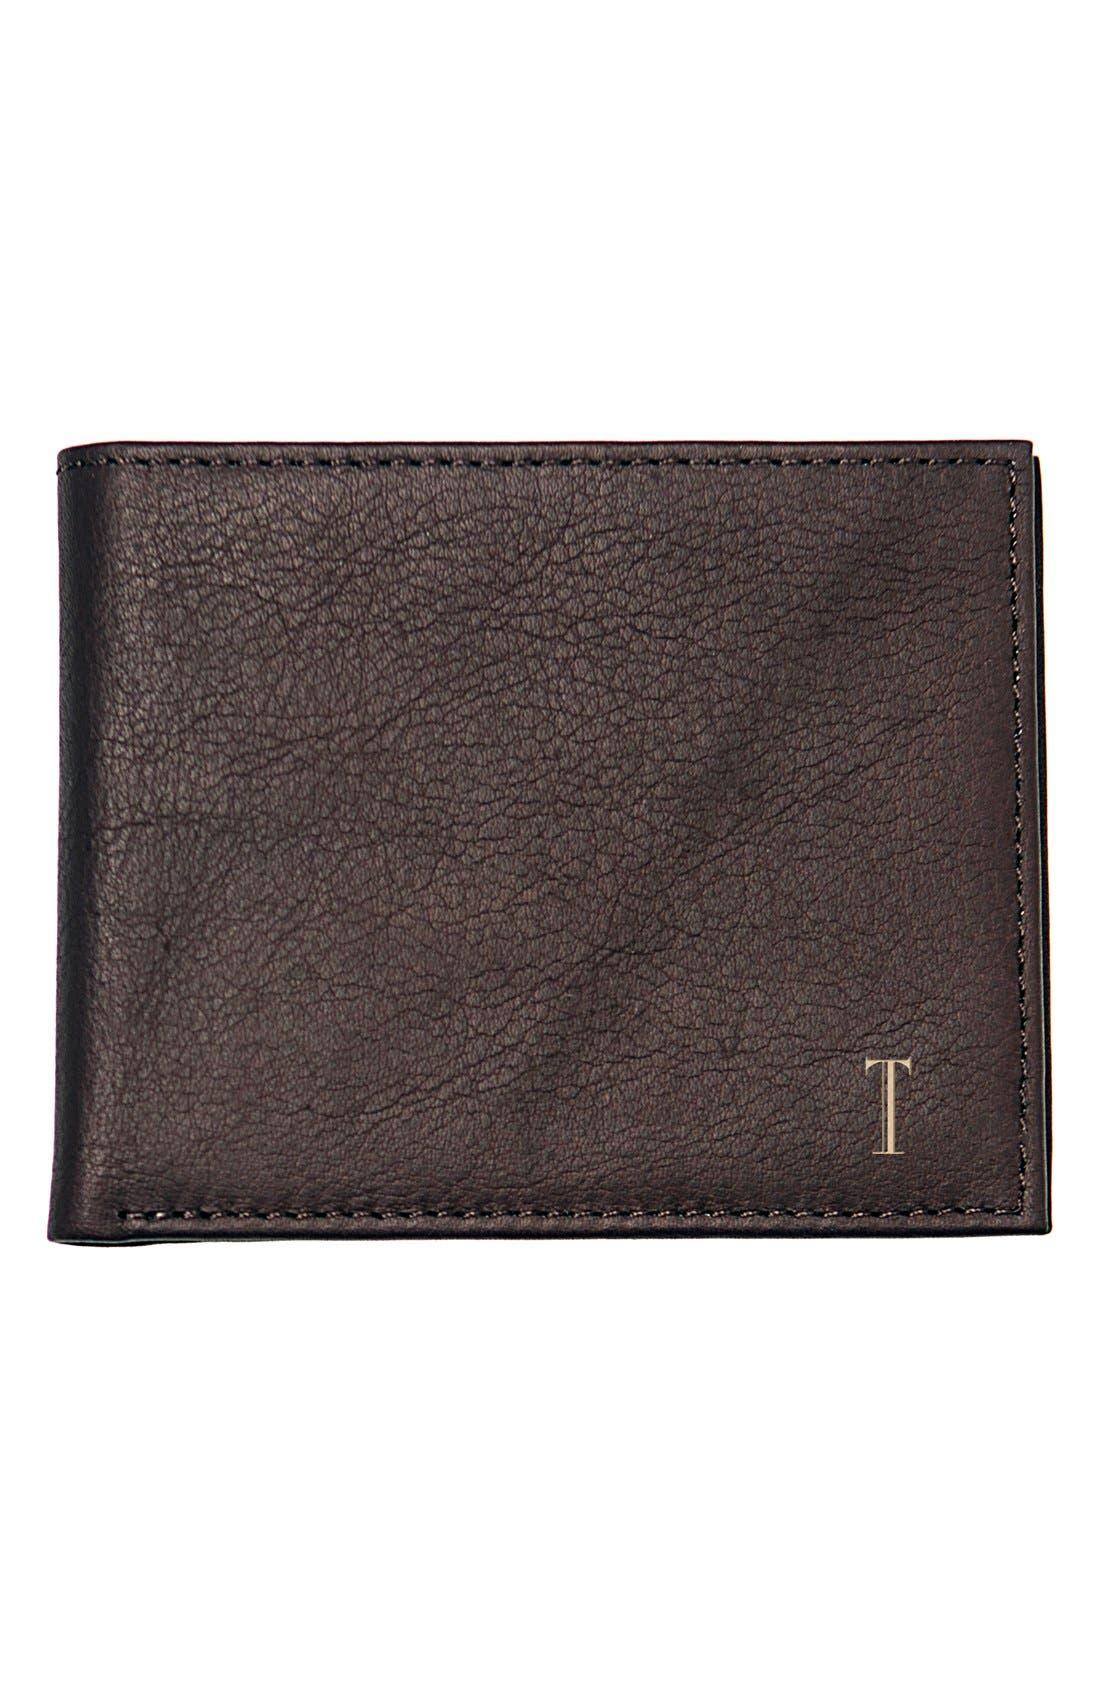 Cathy's Concepts Monogram Bifold Wallet